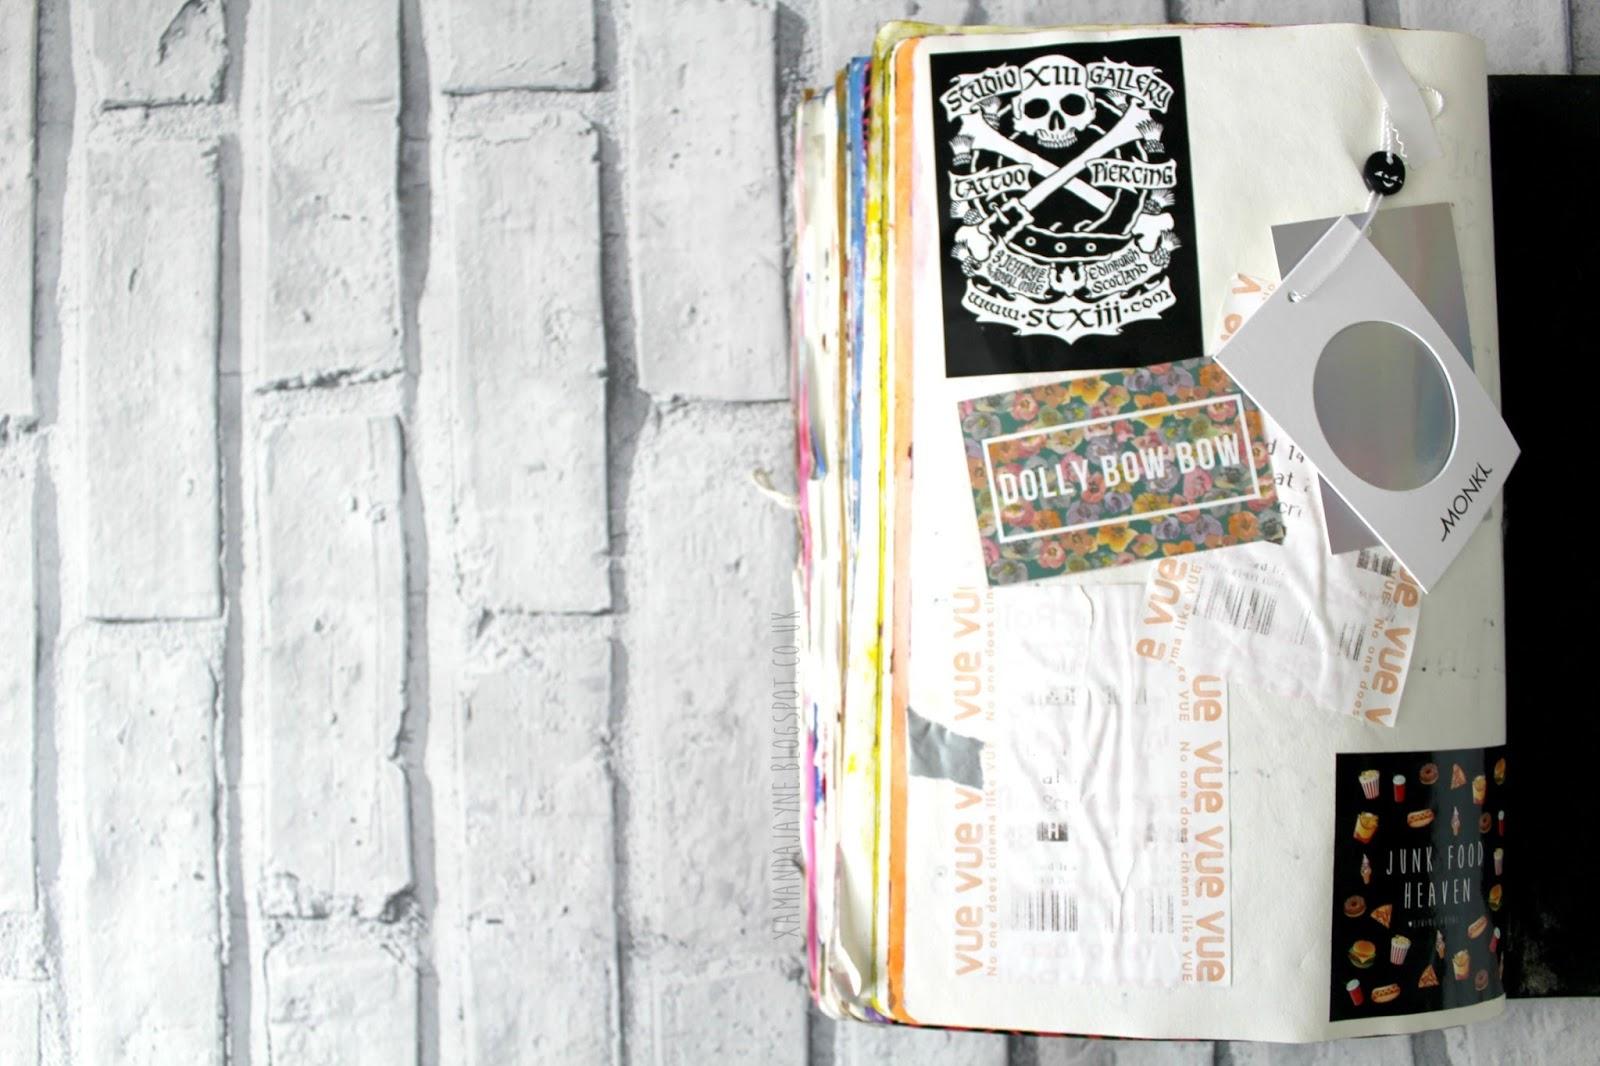 art journal, tips and tricks, art, creative, art journalling for beginners, how-to art journal